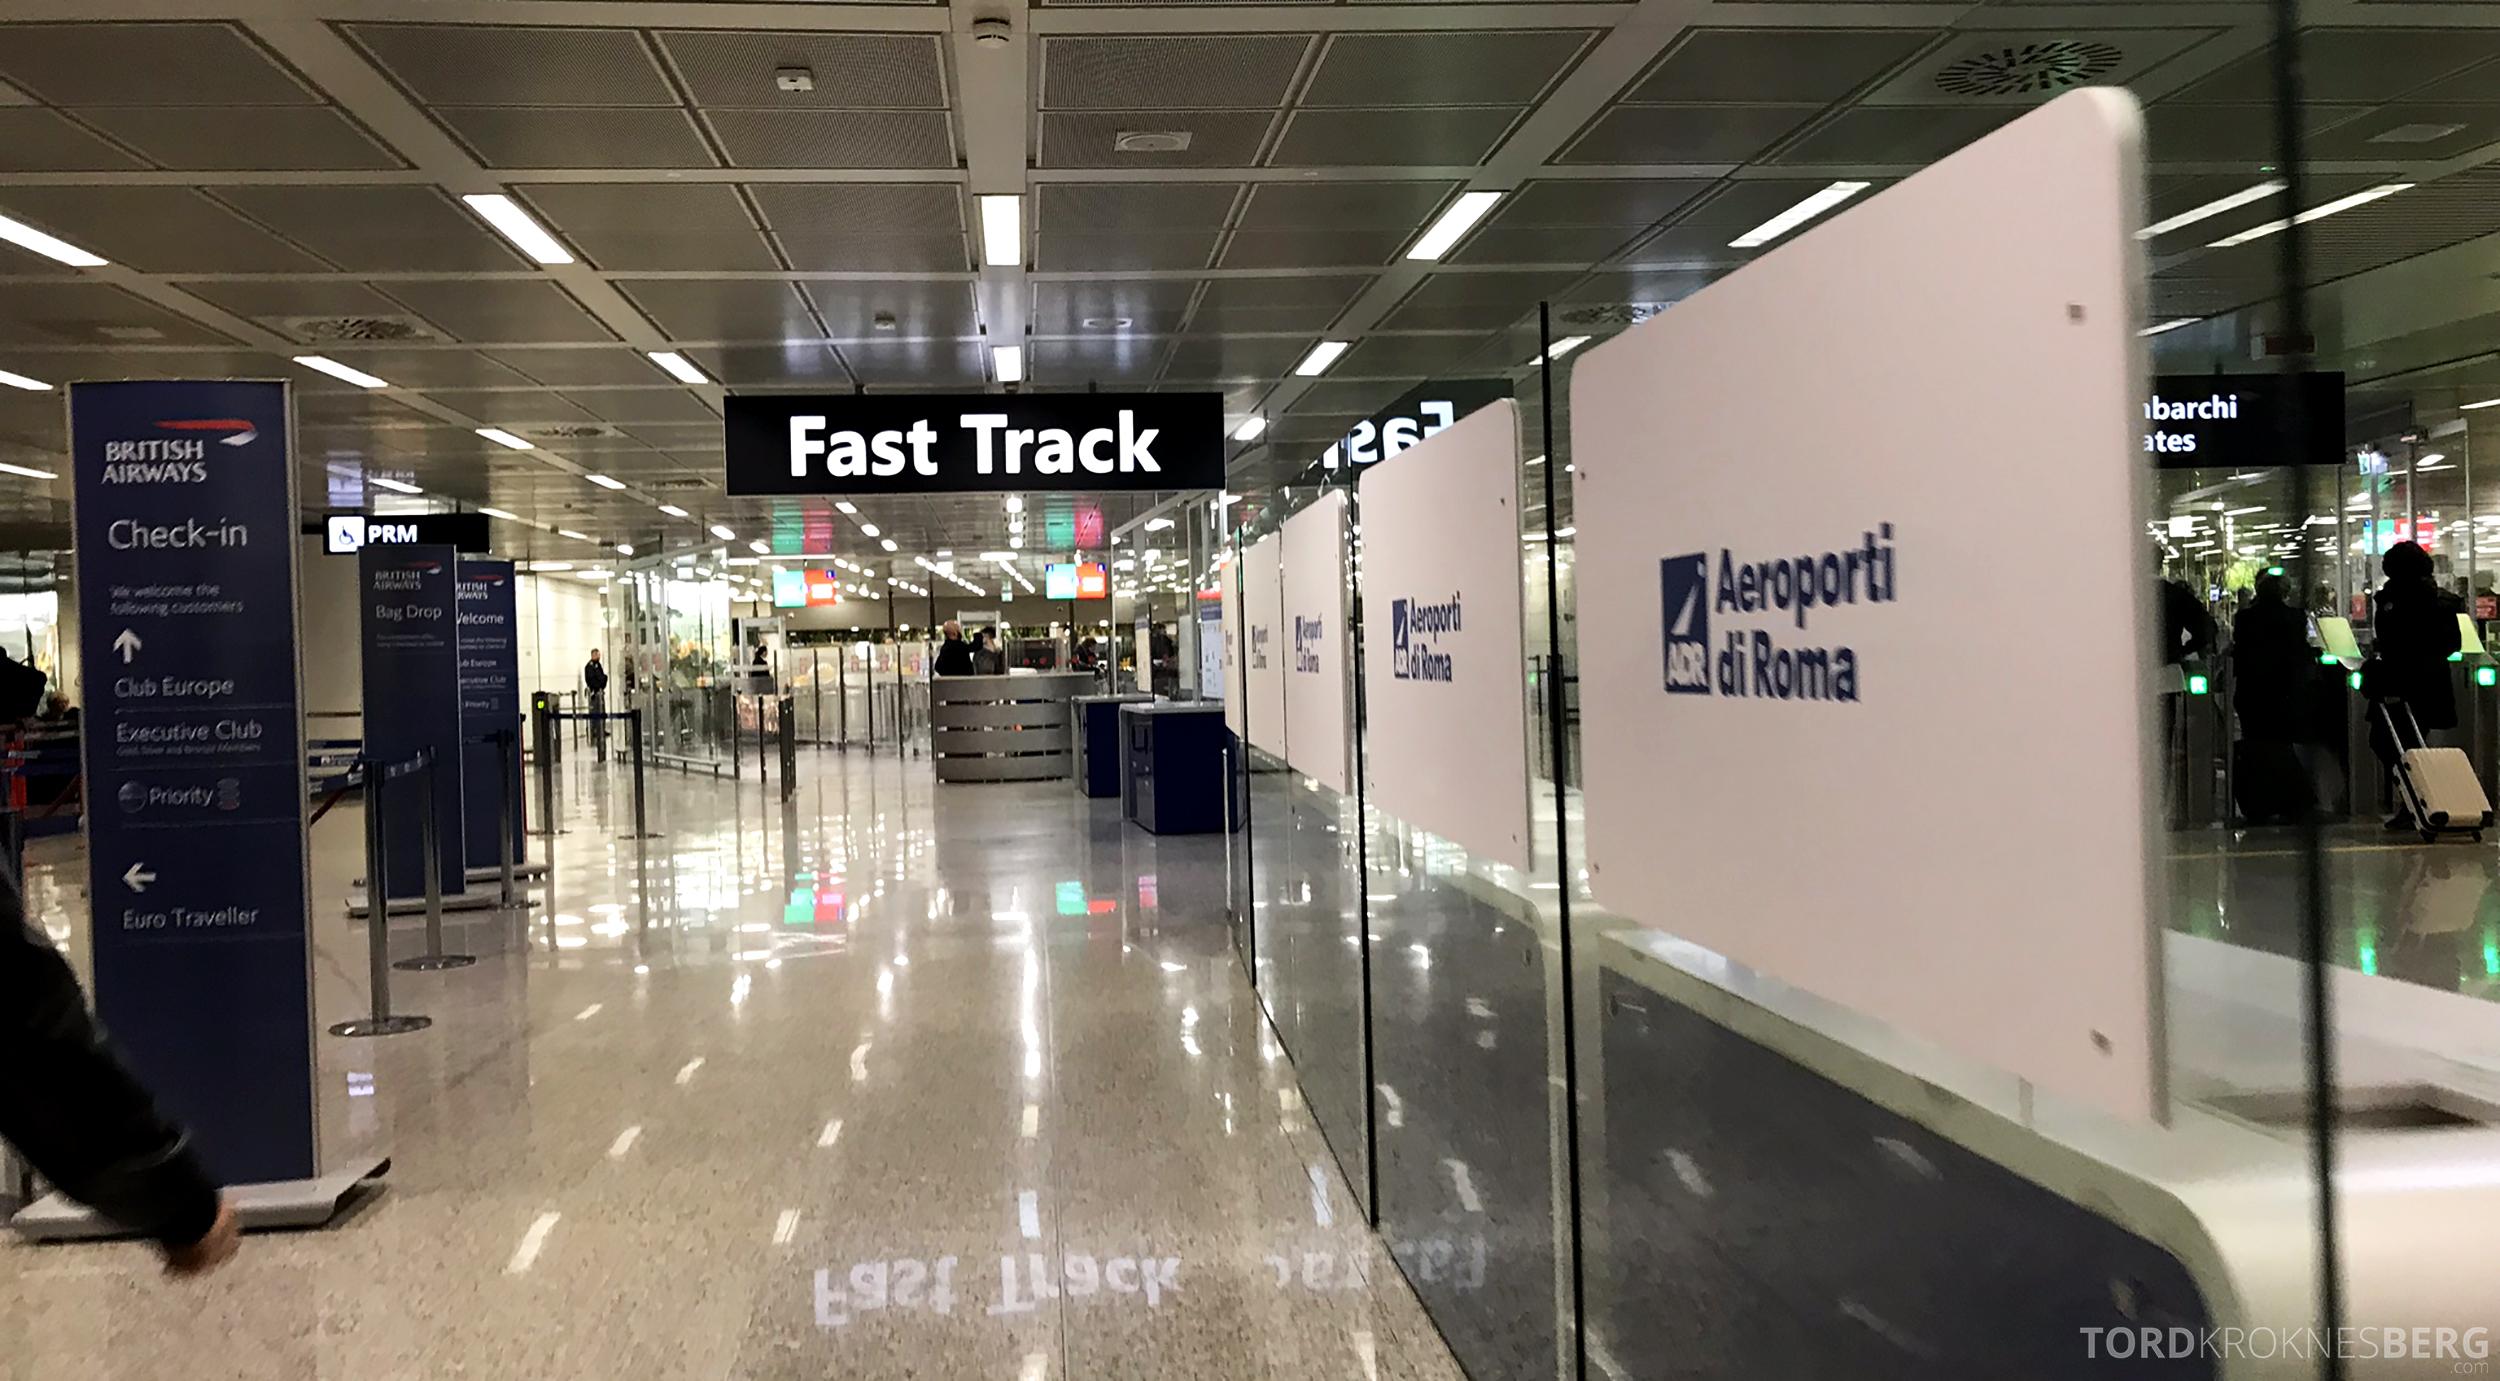 Lufthansa Business Class Rome Frankfurt Oslo fast track